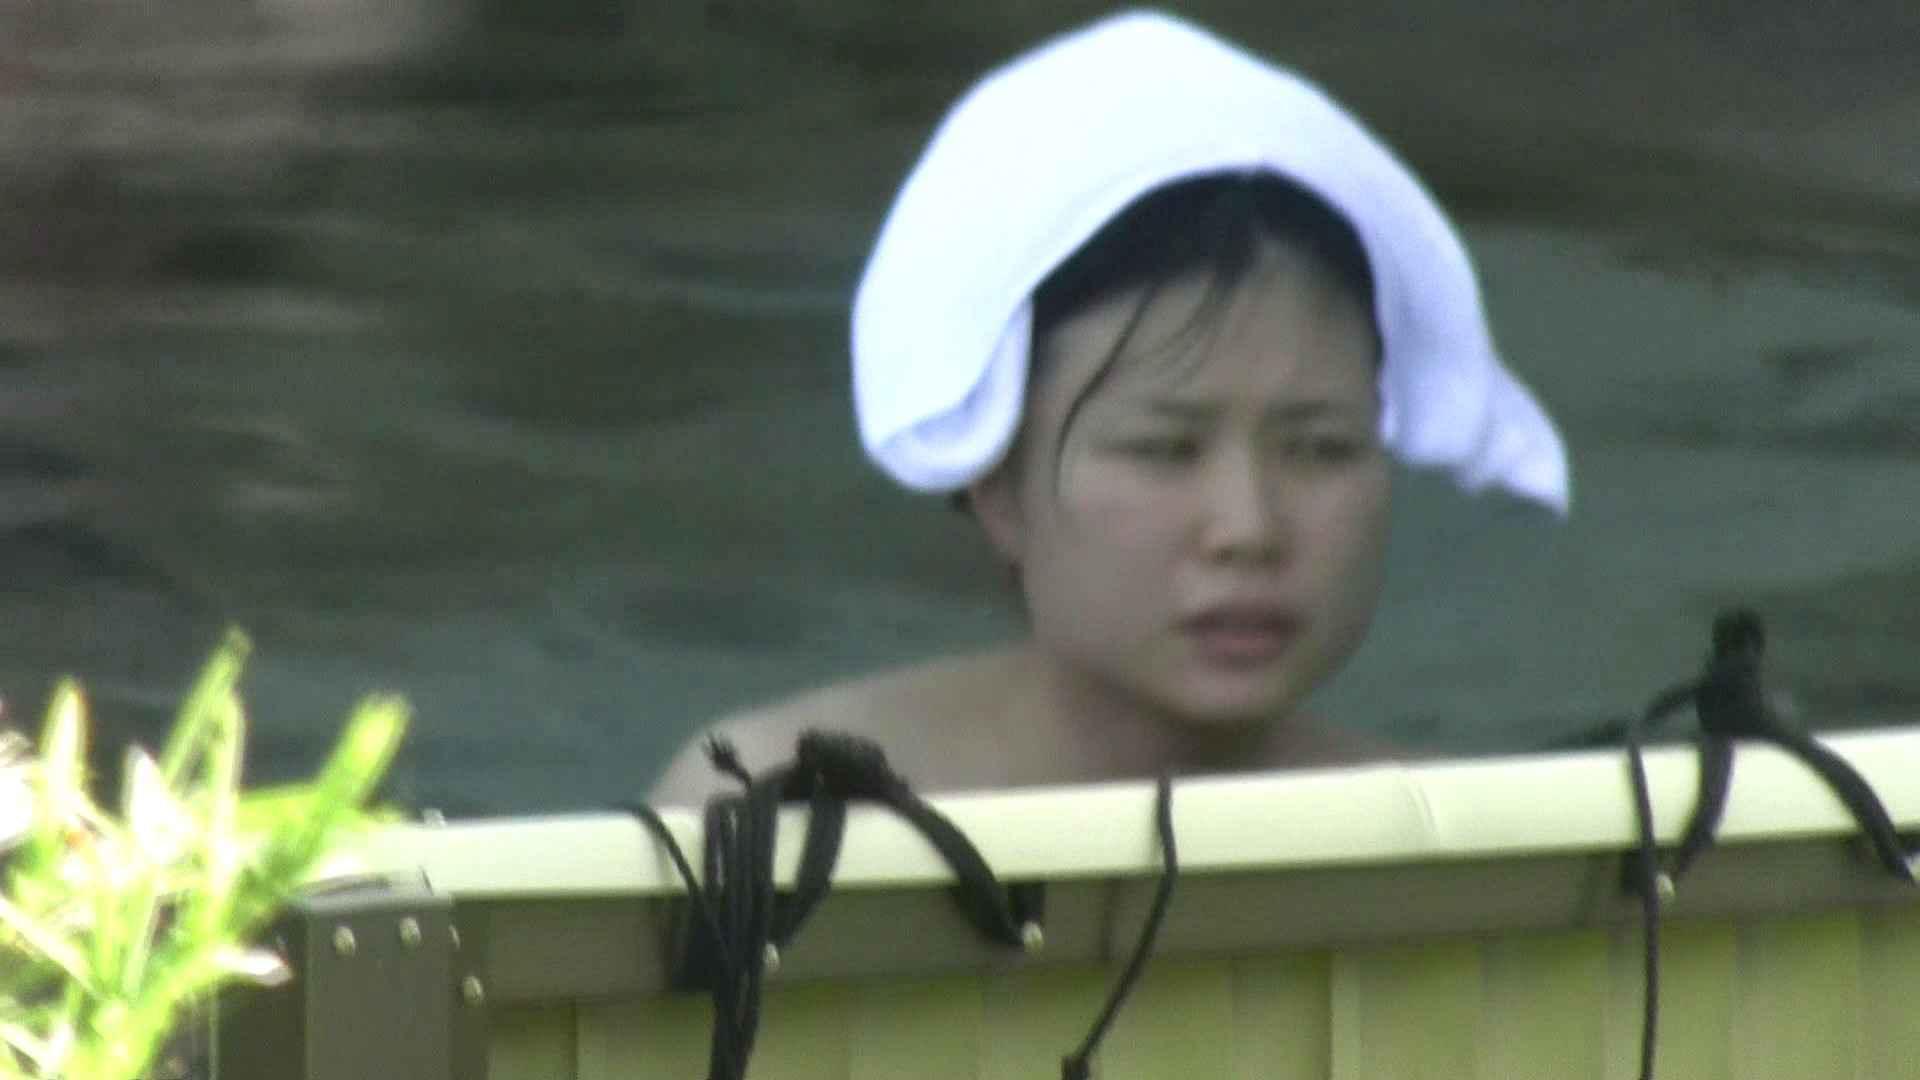 Aquaな露天風呂Vol.183 露天風呂編  104PIX 28